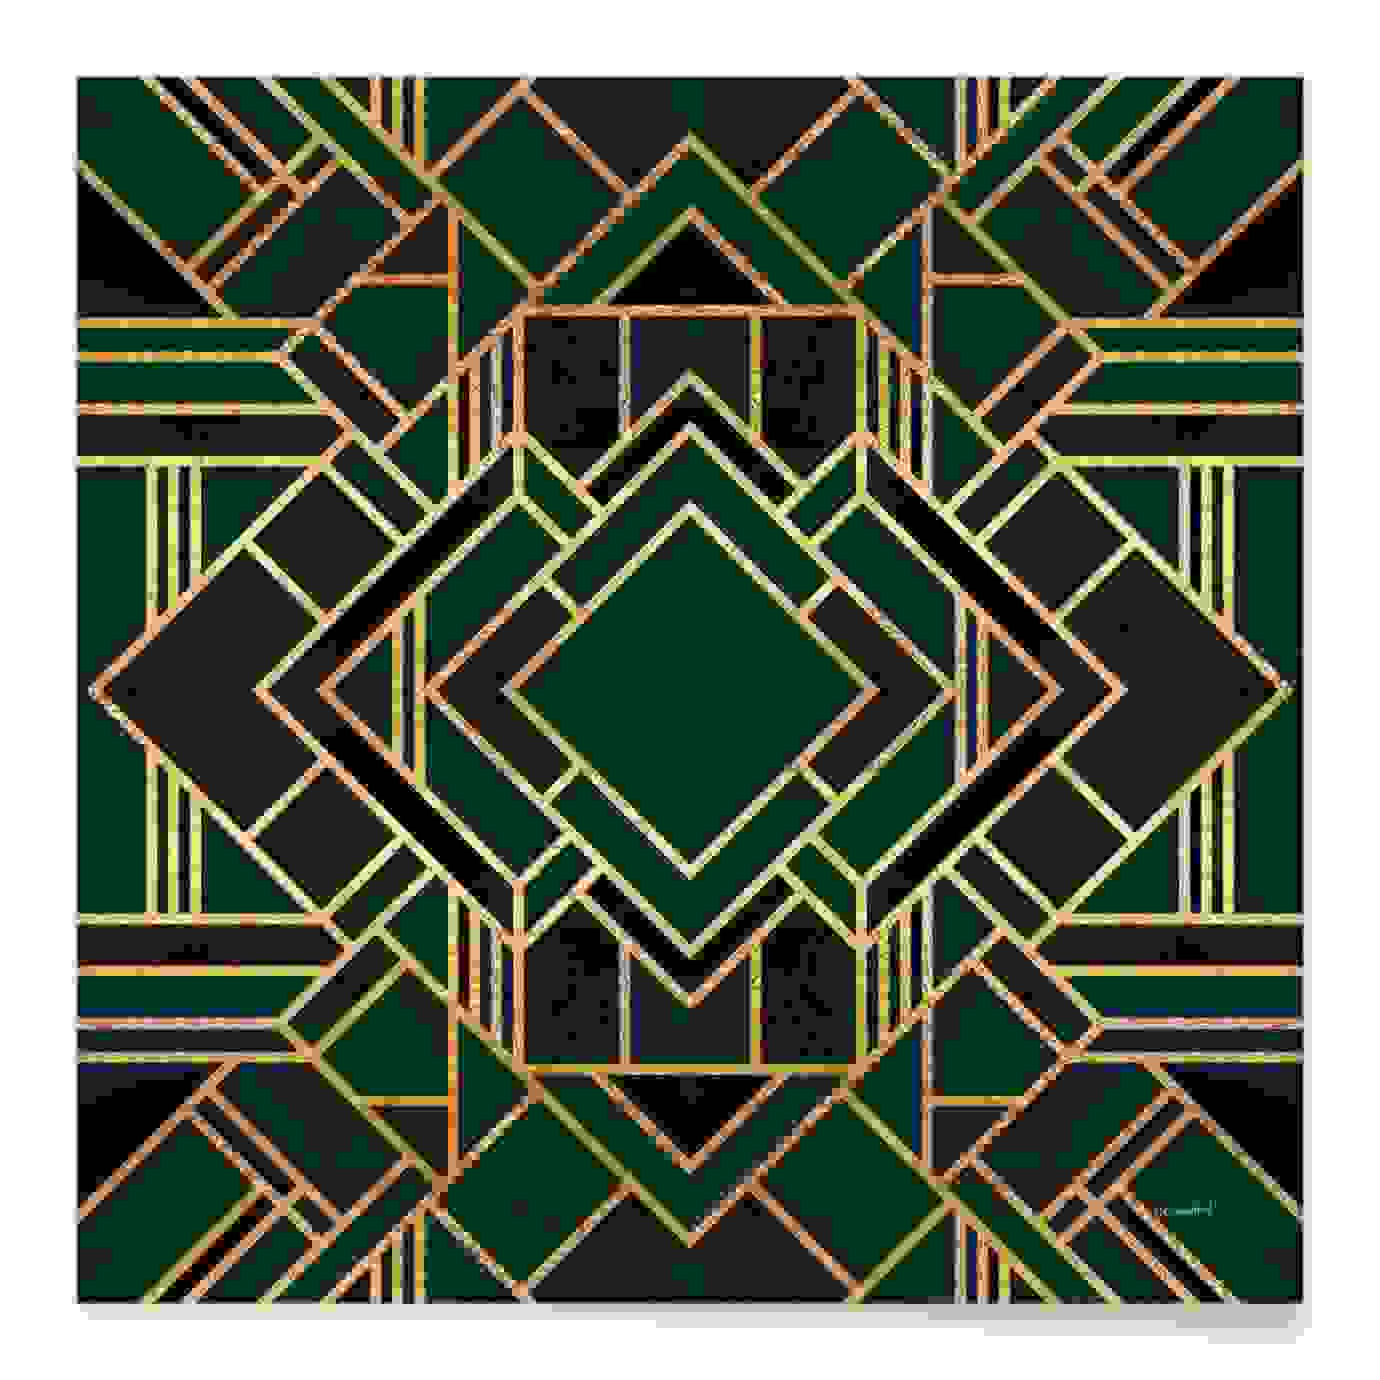 Art Deco pattern   Image source: wayfair.com